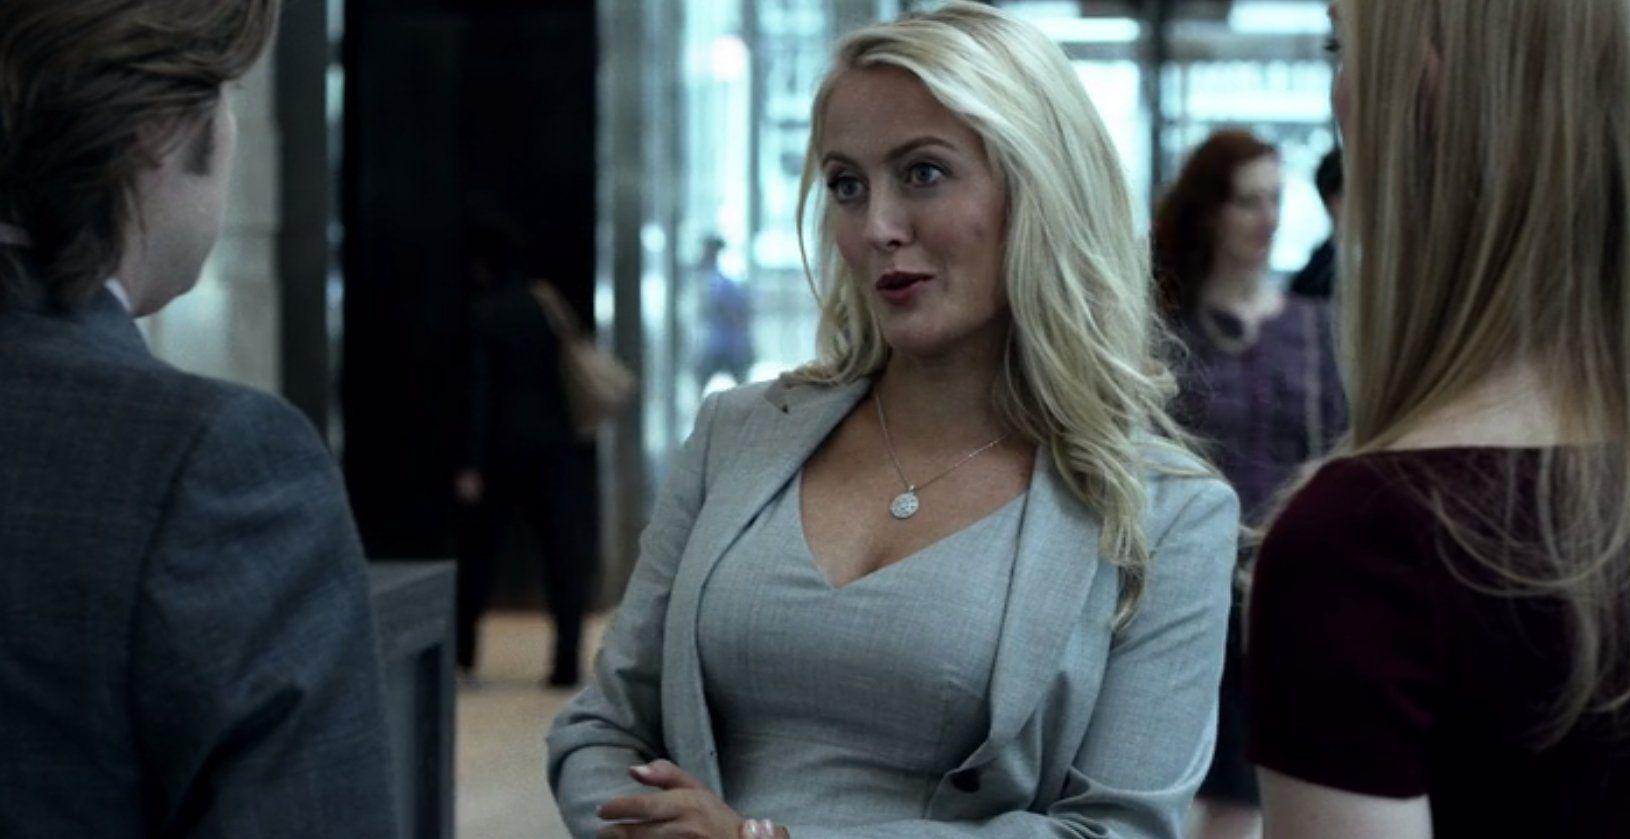 daredevil season 3 marvel netflix cancel amy rutberg